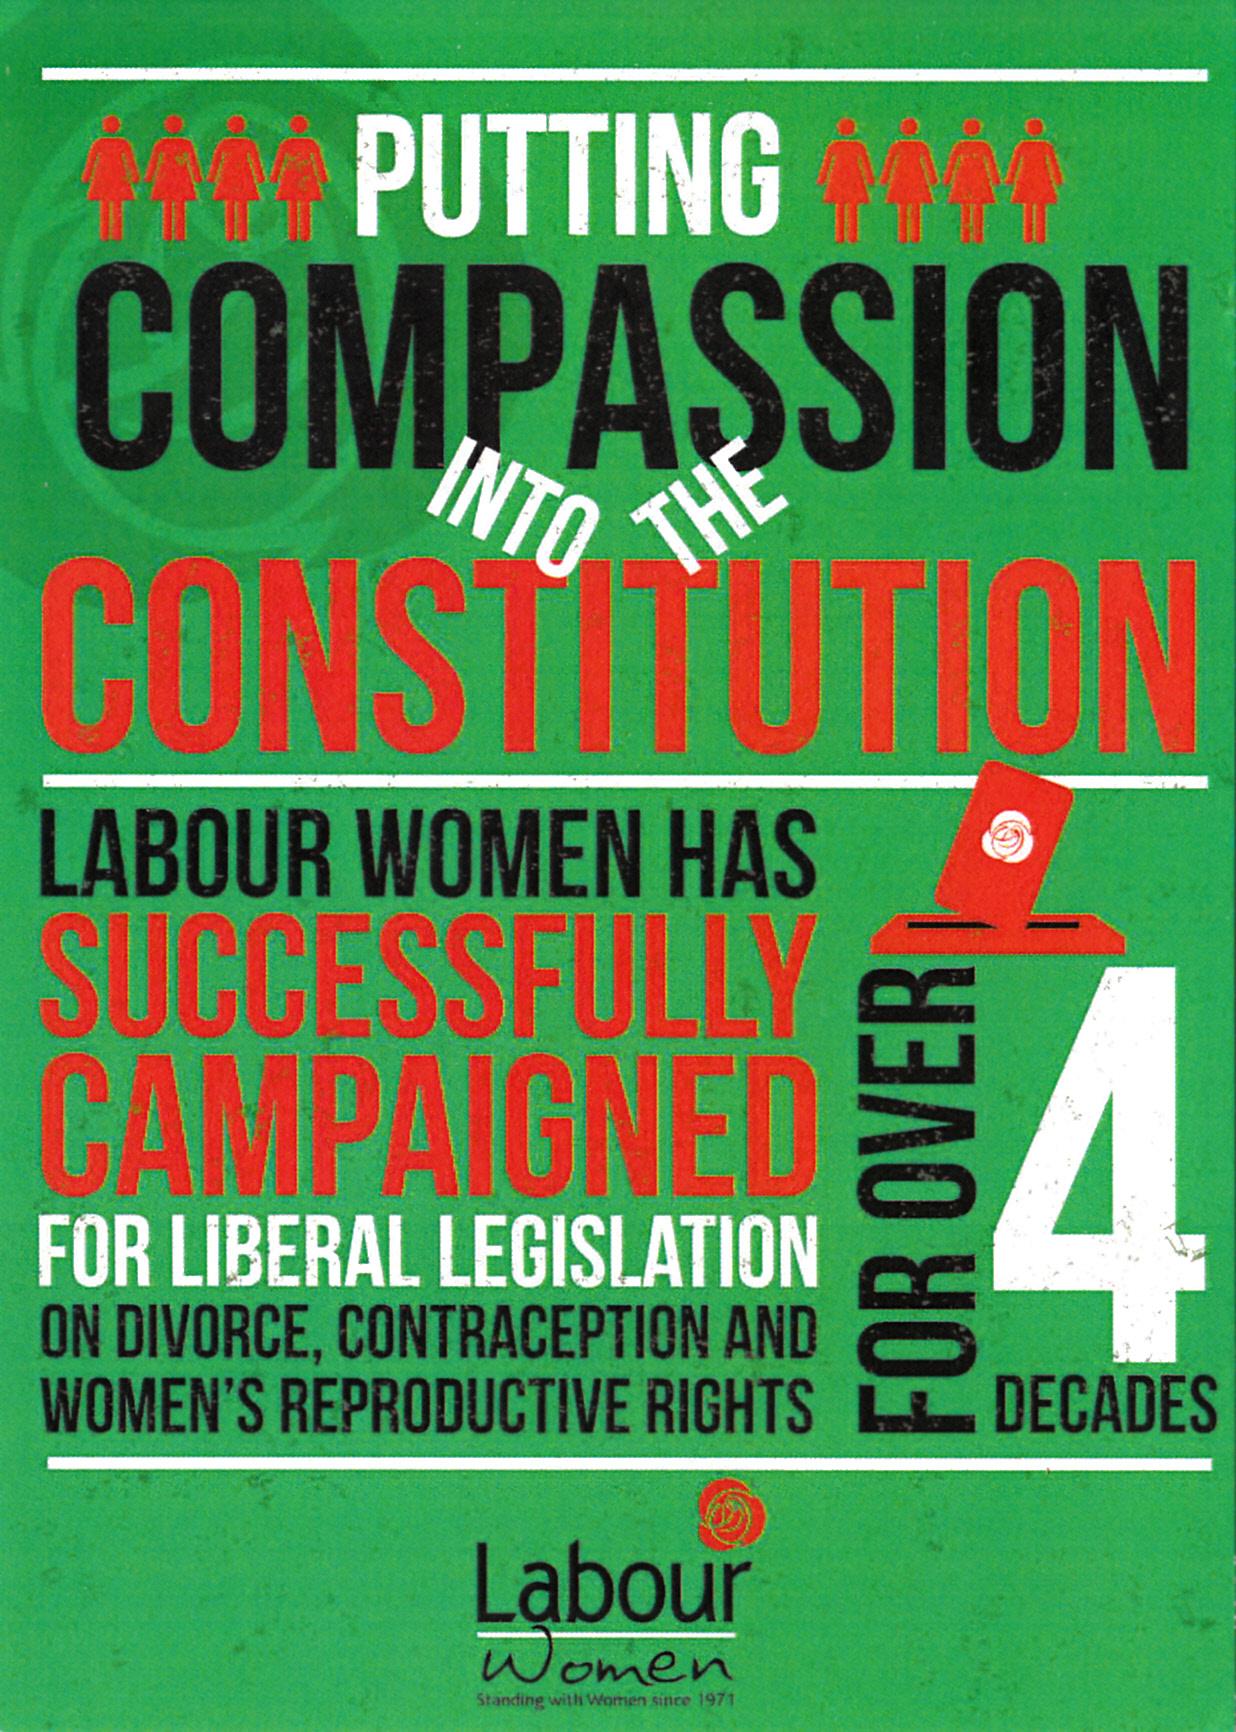 Labour_Irlanda_0007